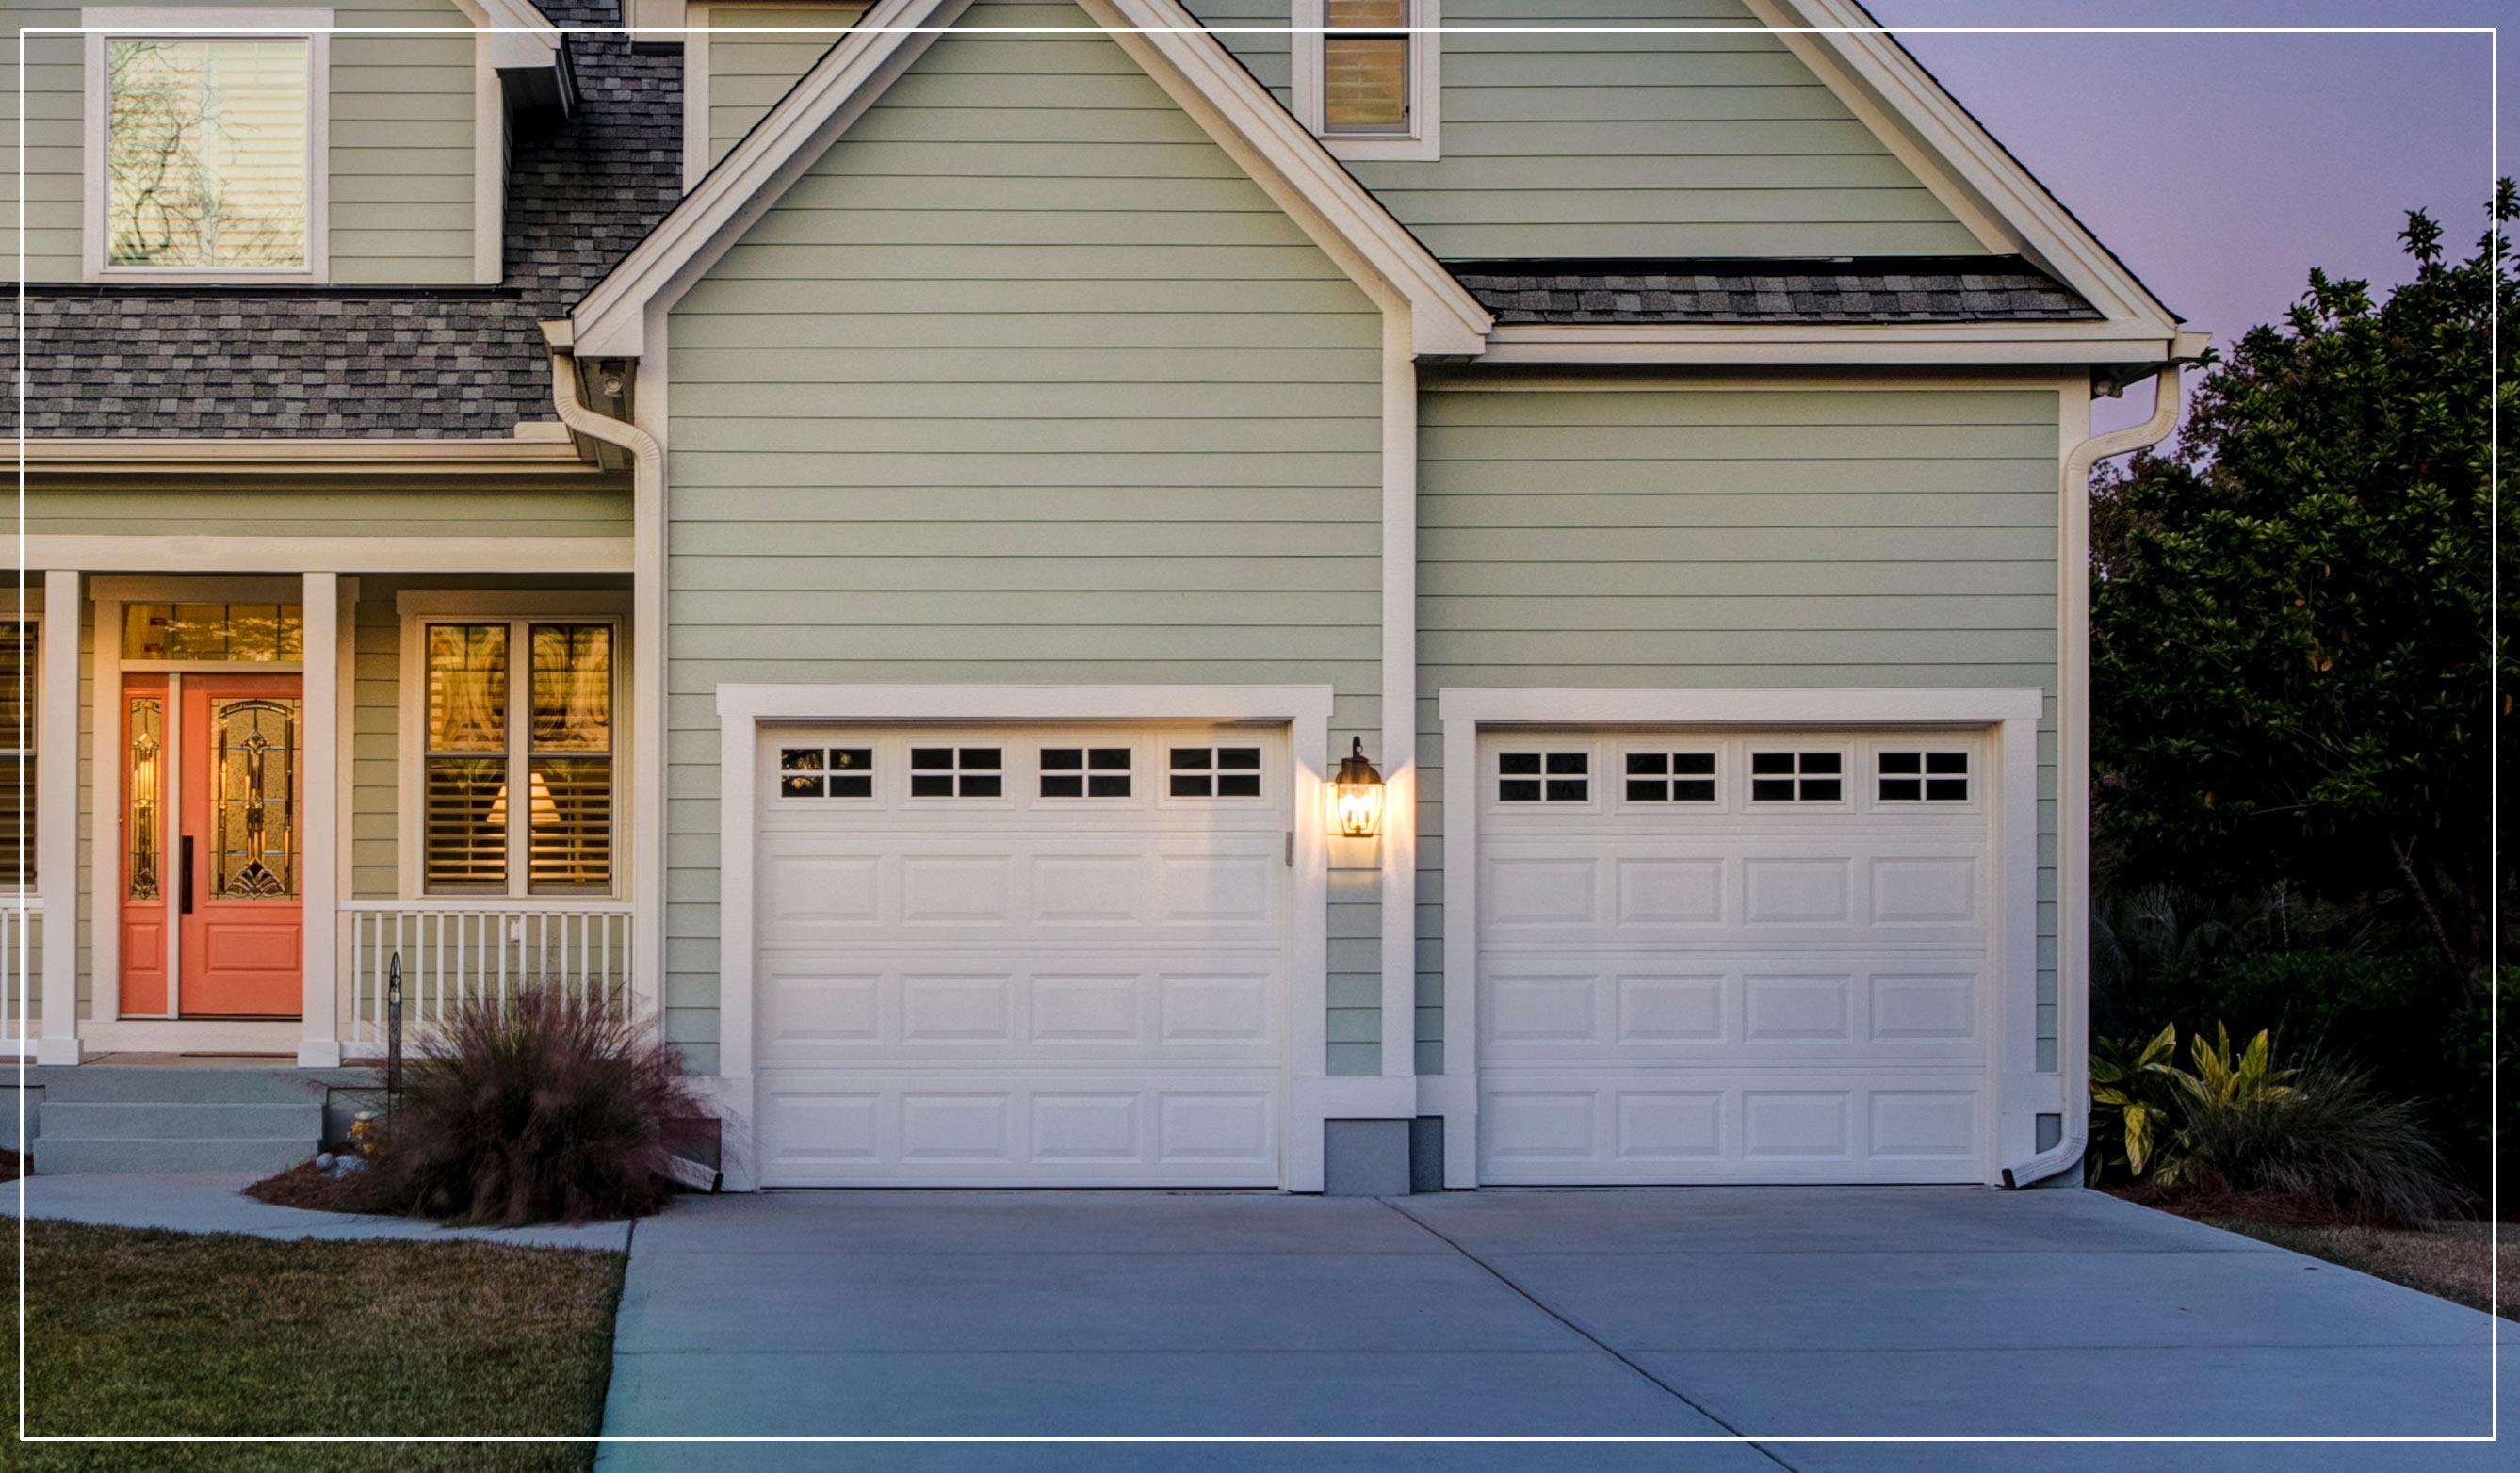 Sarasotas-garage-door-repair-company